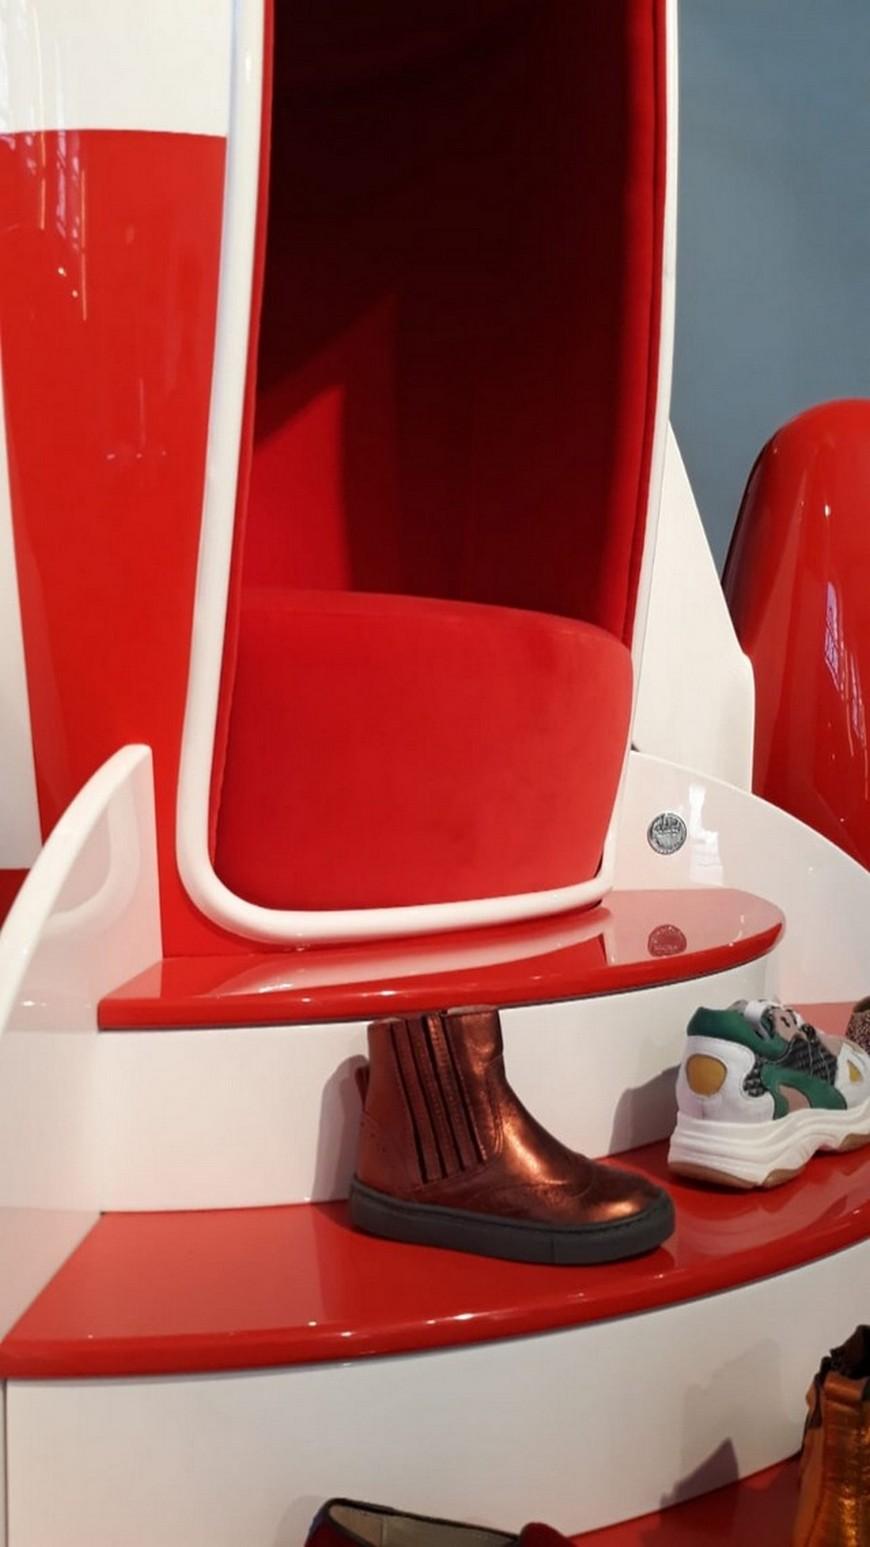 kids bedroom furniture Kids Bedroom Furniture – Rocky Rocket Dropped by Portugal Fashion 2019 Kids Bedroom Furniture Rocky Rocket Dropped by Portugal Fashion 2019 2